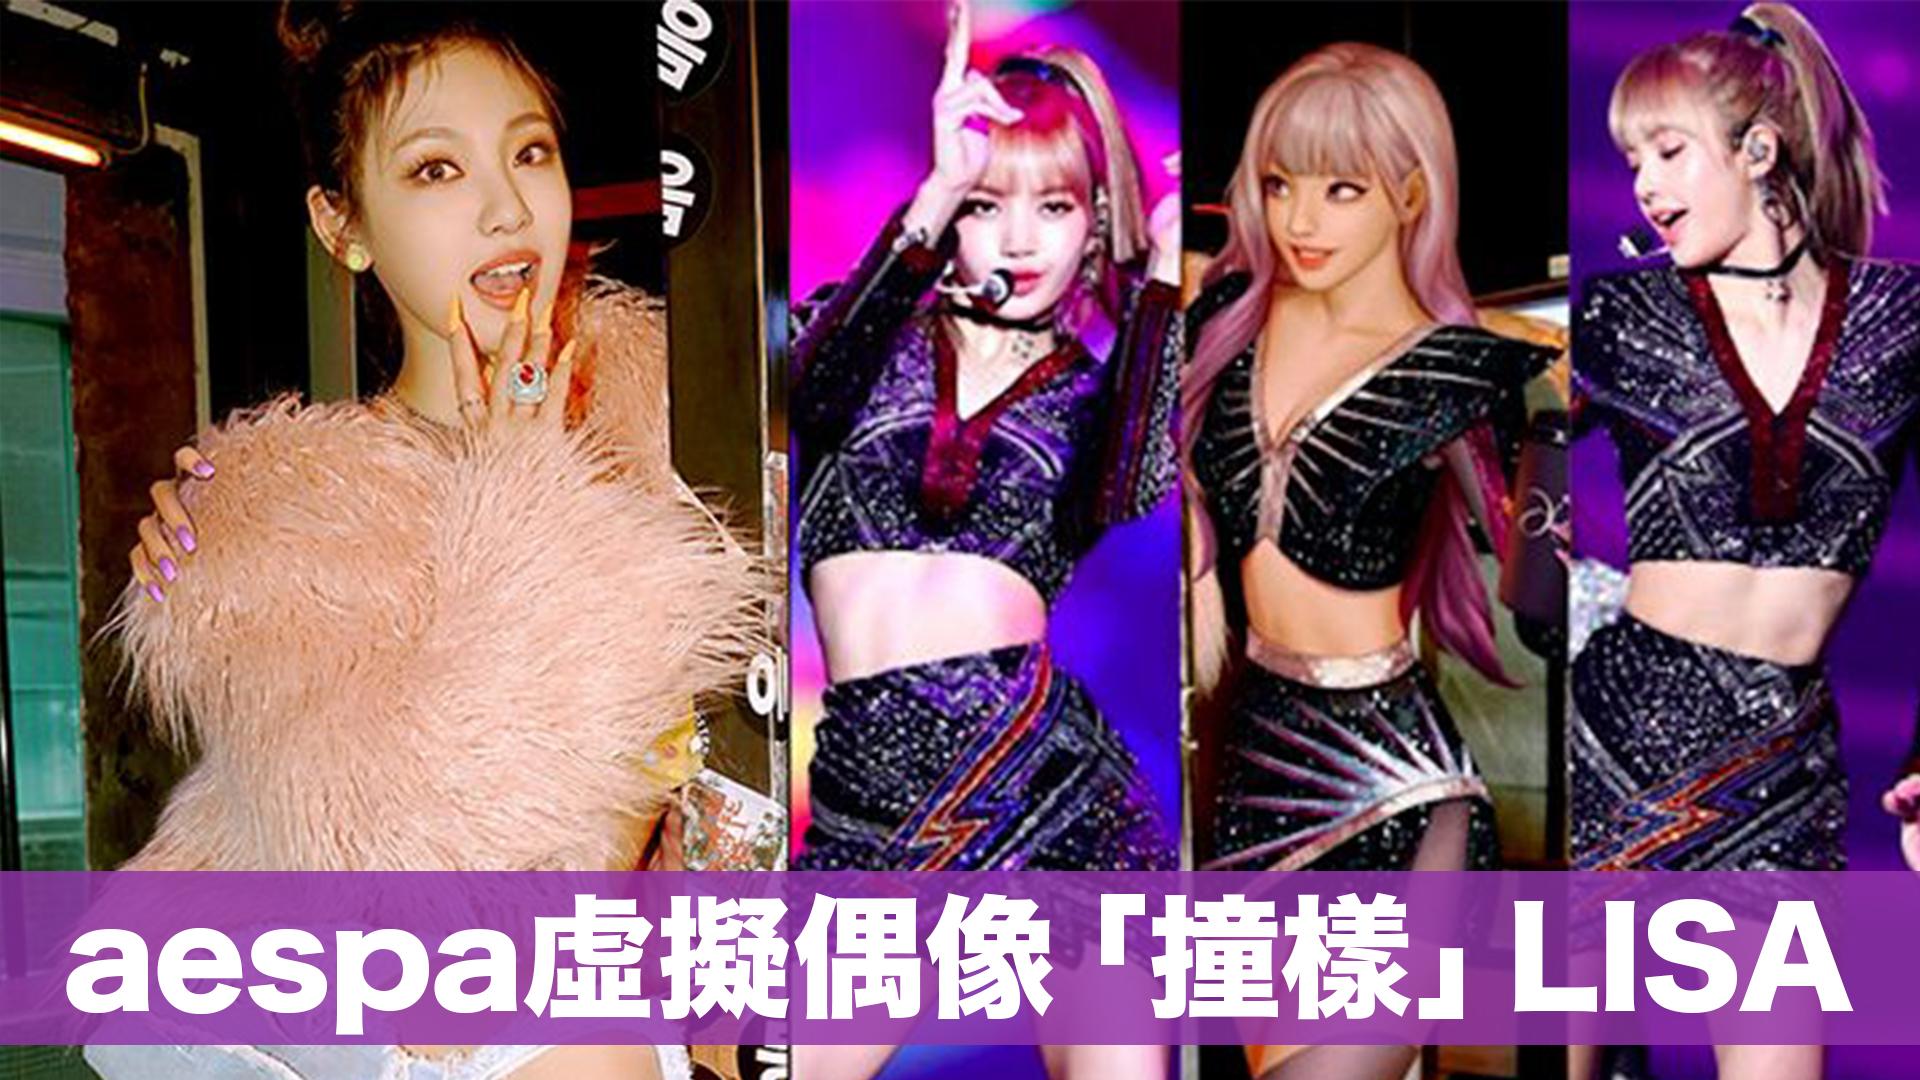 SM新女團aespa虛擬偶像「撞樣」LISA 網民o晒嘴